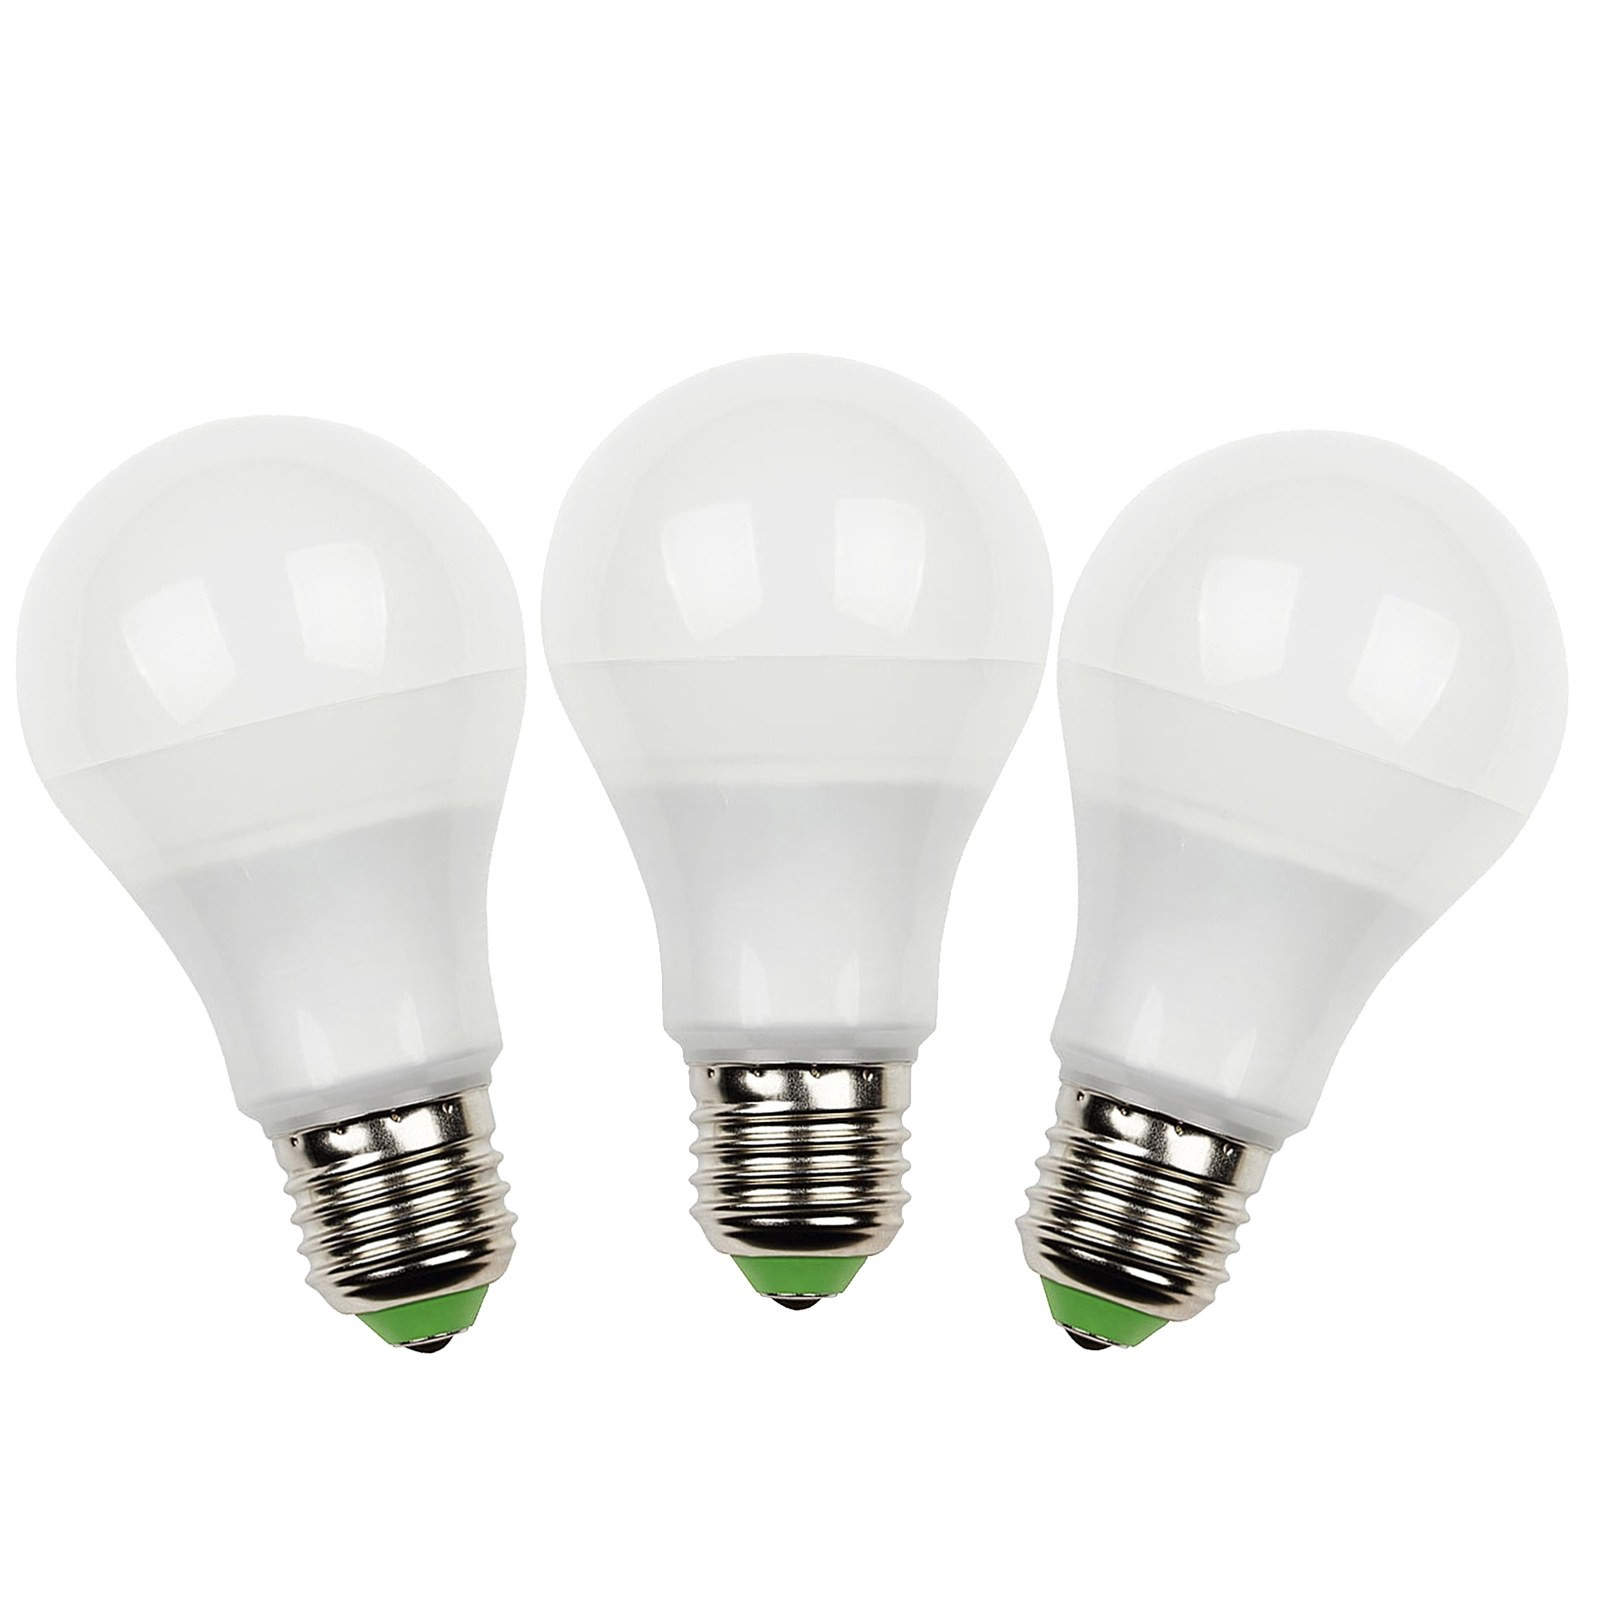 3 pz lampade lampada lampadine a led luce bianca fredda